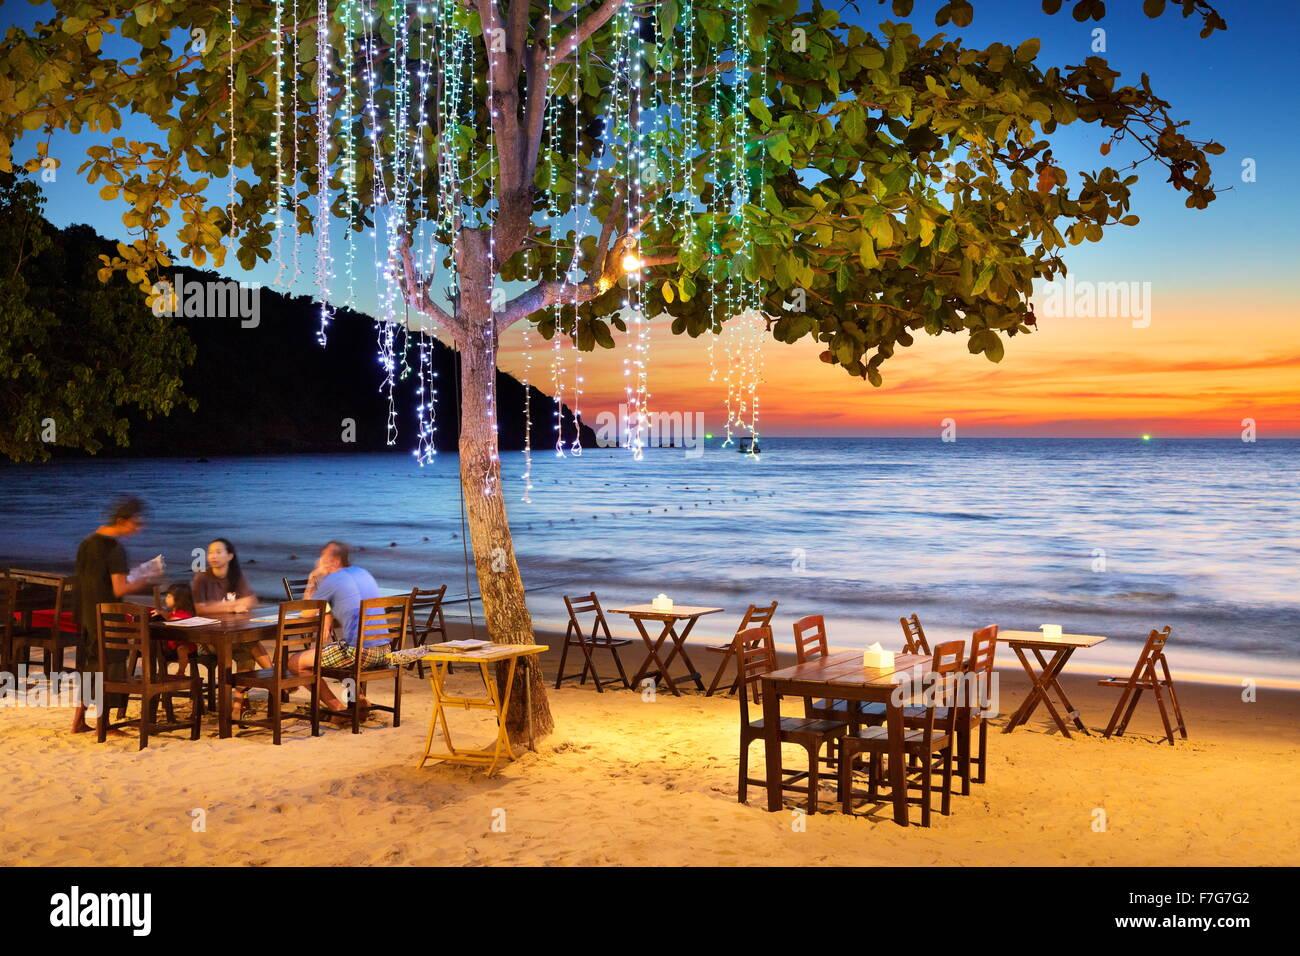 Beach restaurant after sunset, Ko Samet Island, Thailand - Stock Image